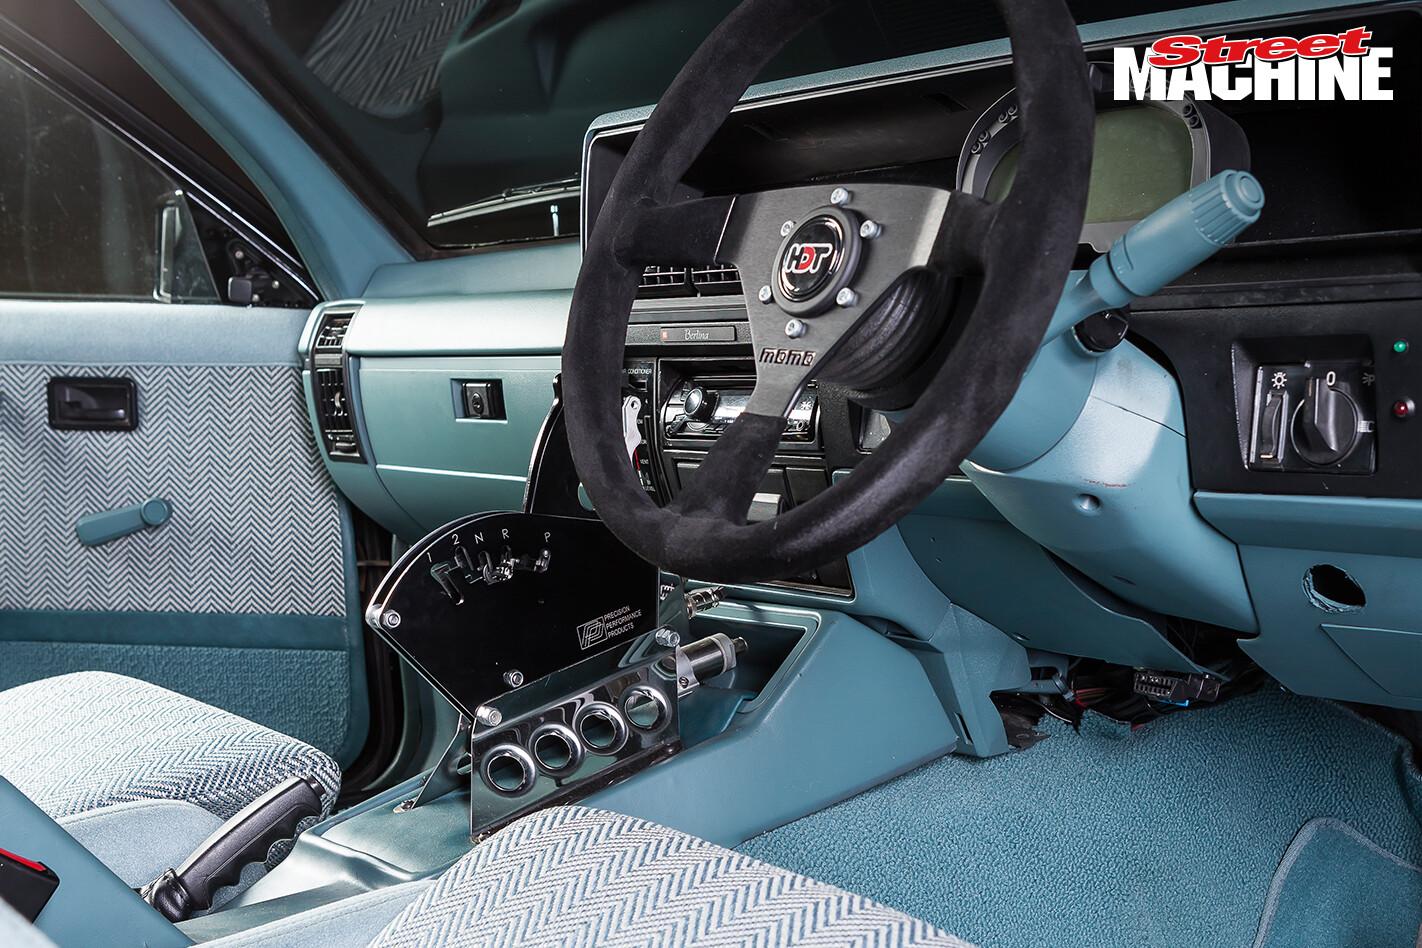 VK Commodore Brocky LS 1 Turbo Interior 1 Nw Jpg